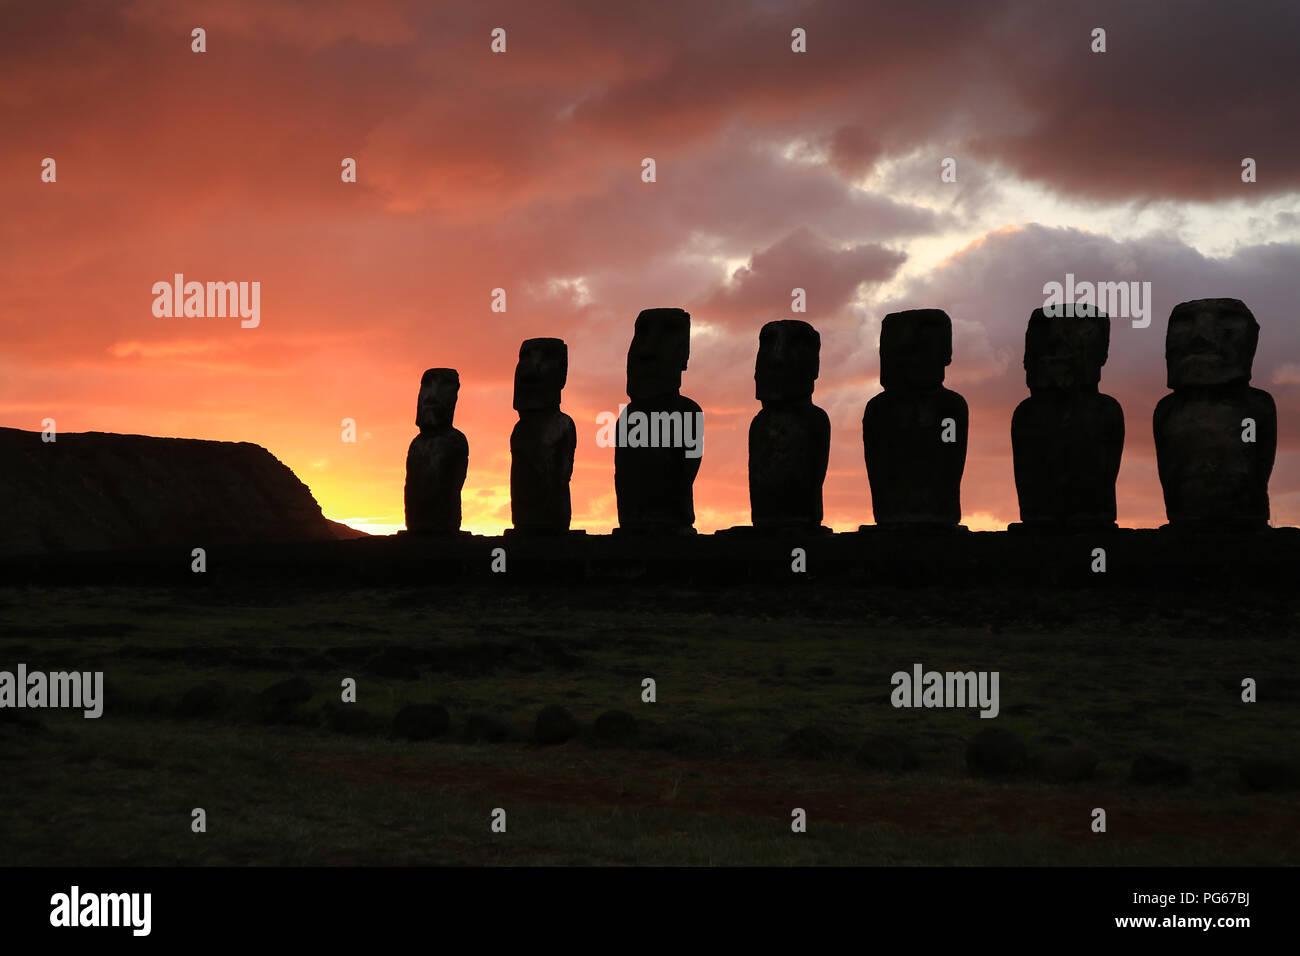 Silueta de enormes estatuas moai de Ahu Tongariki contra bellos amaneceres cielo nublado, sitio arqueológico en la Isla de Pascua, Chile Imagen De Stock